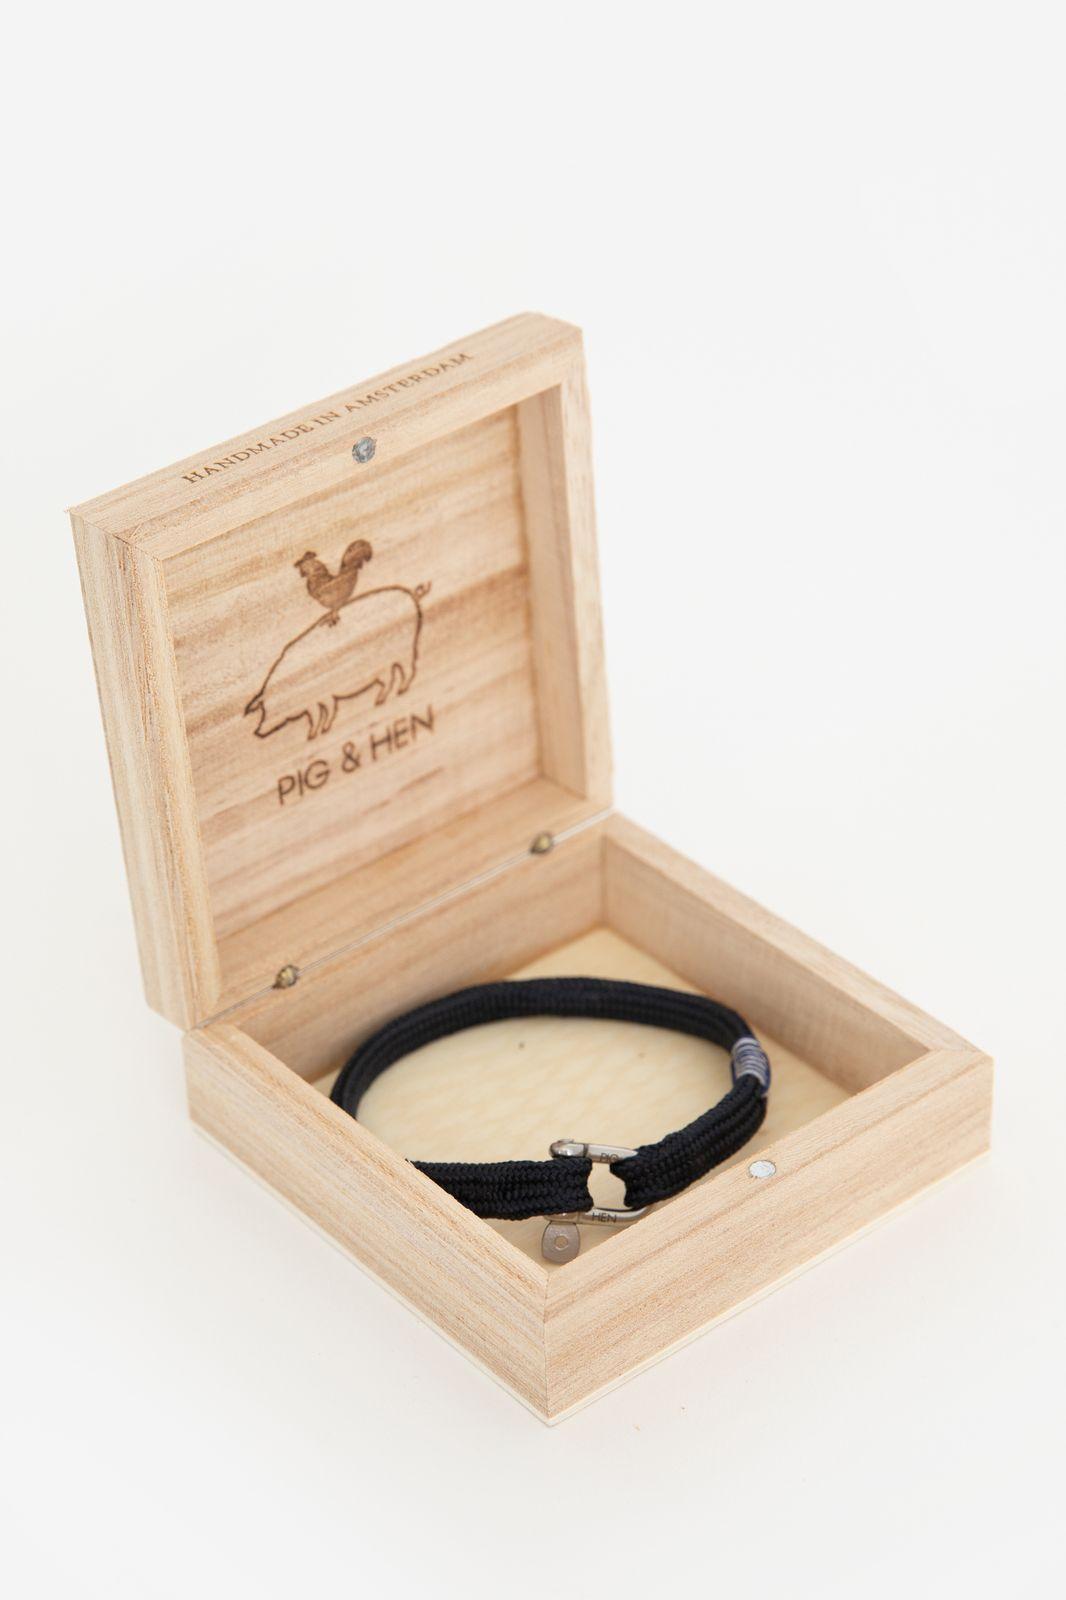 Pig & Hen Vicious Vik armband blauw - Heren | Sissy-Boy